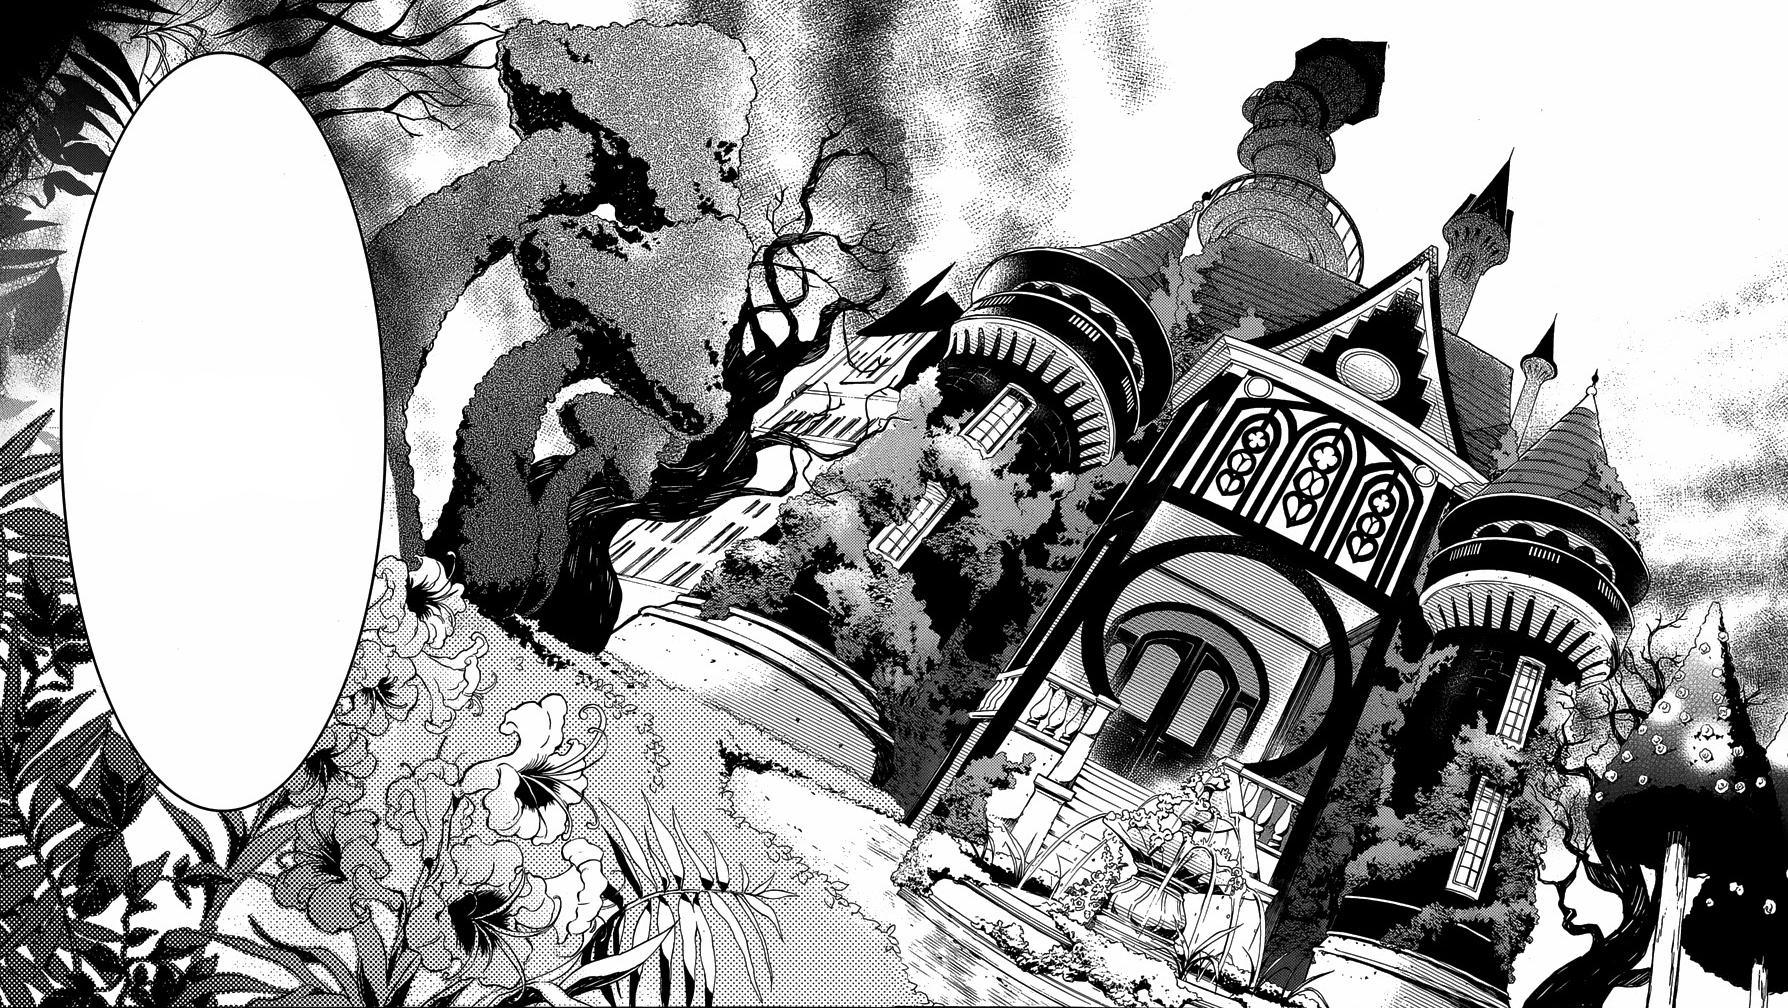 emerald castle kuroshitsuji wiki fandom powered by wikia